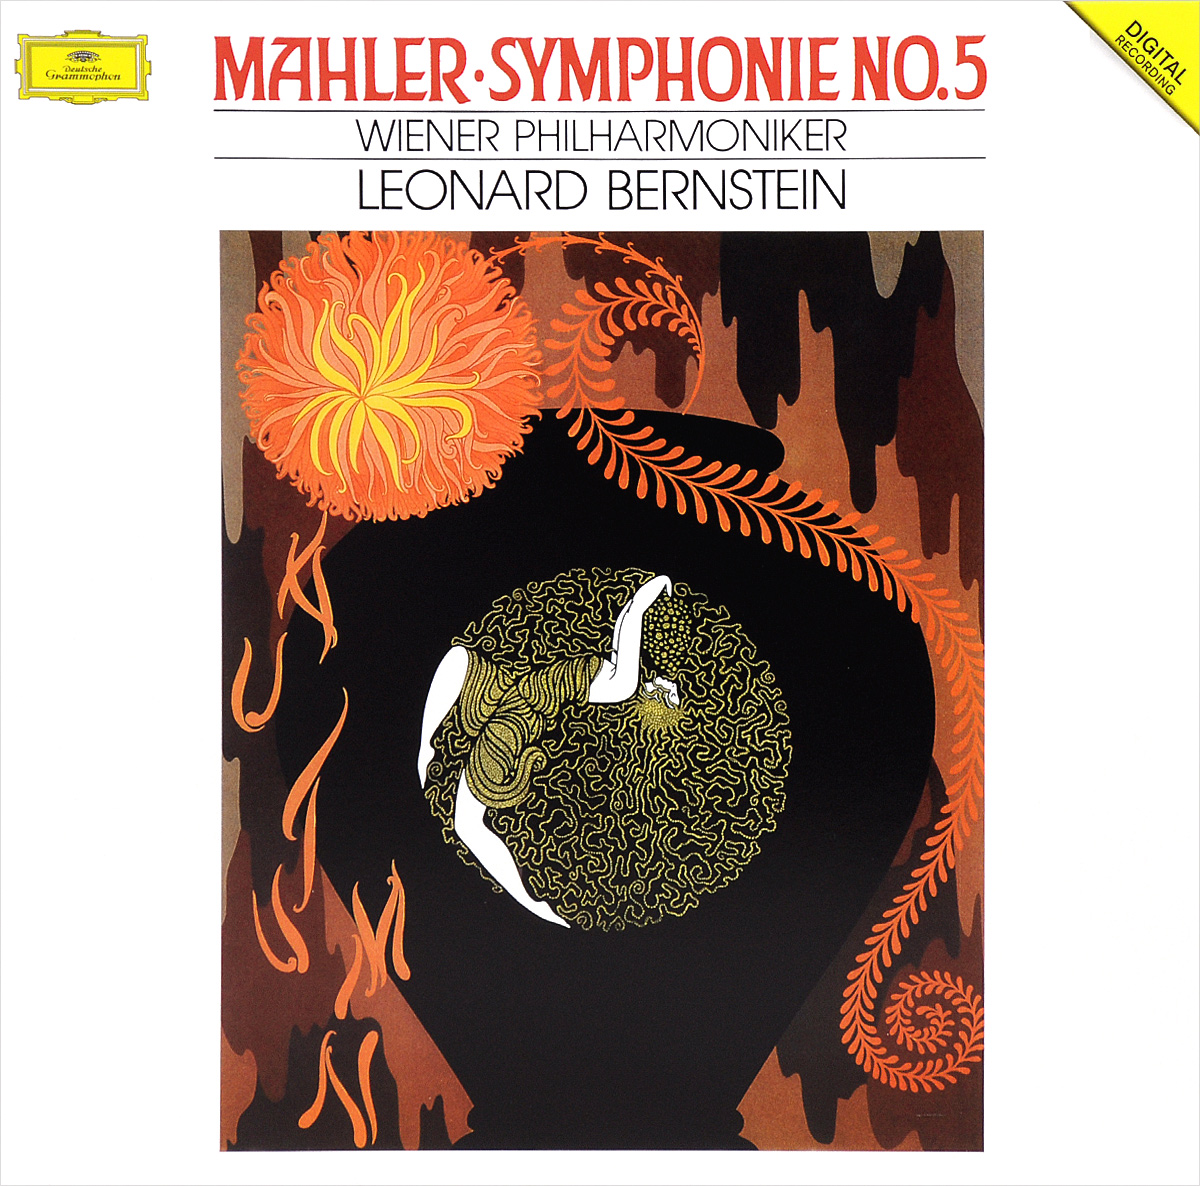 Леонард Бернштейн,Wiener Philharmoniker Leonard Bernstein. Mahler. Symphonie No. 5 (2 LP) wiener index of graphs